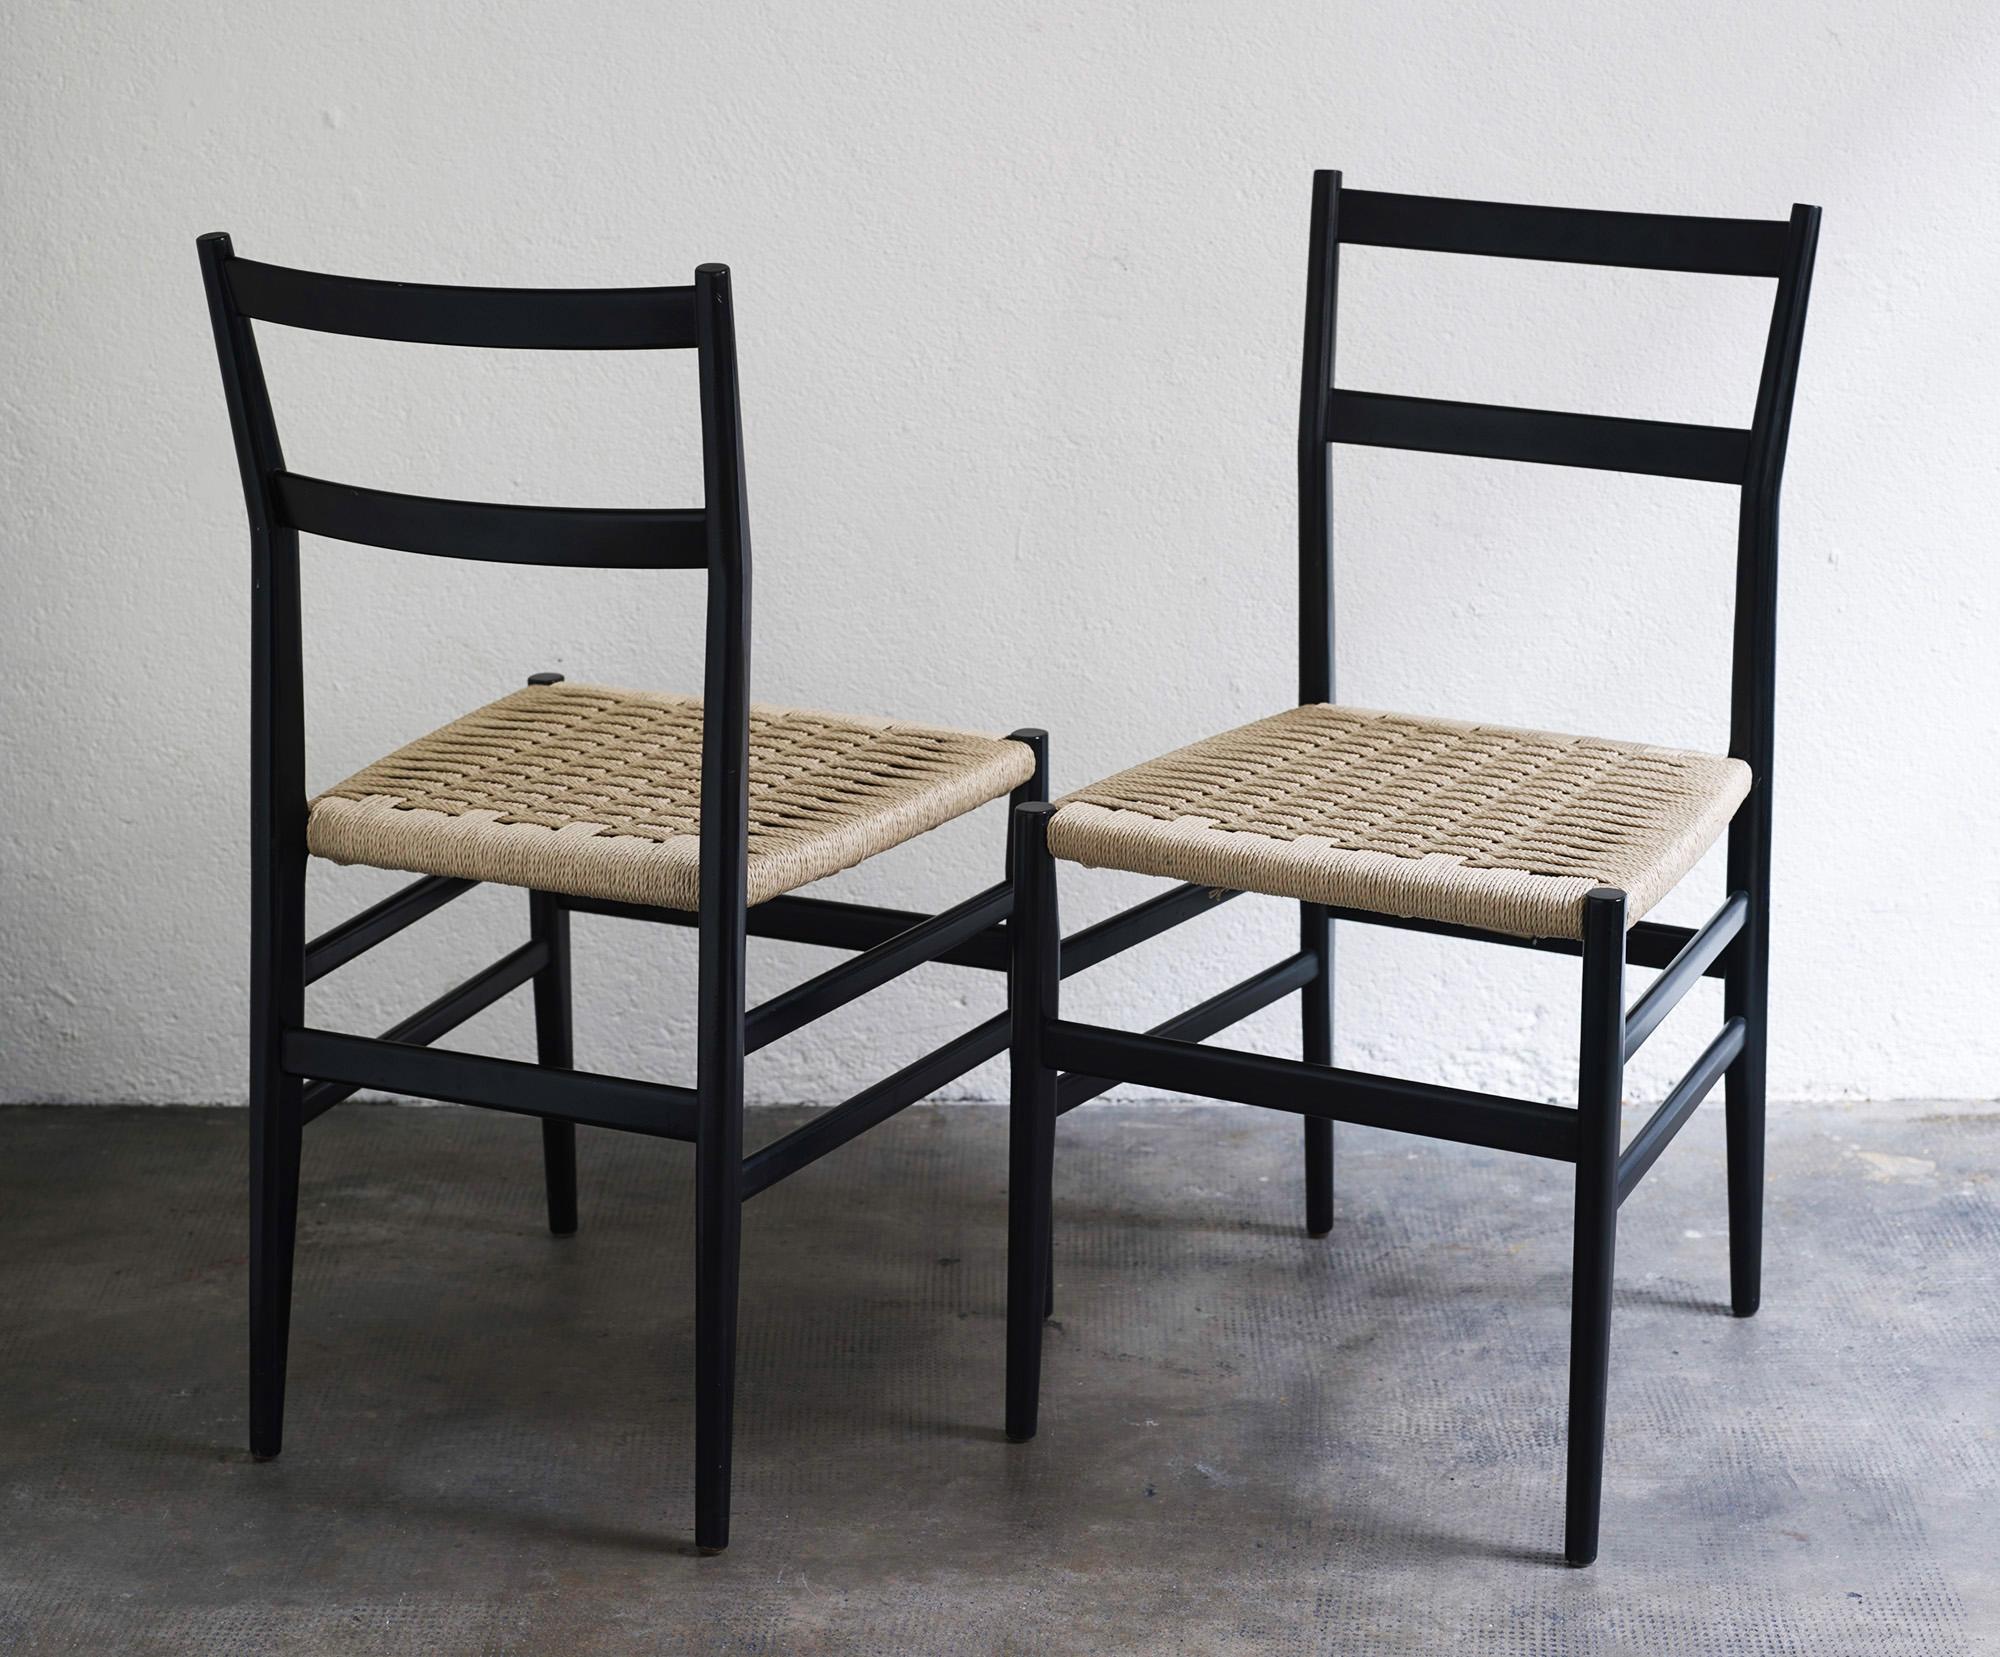 gio-ponti-leggera-chairs-image-03